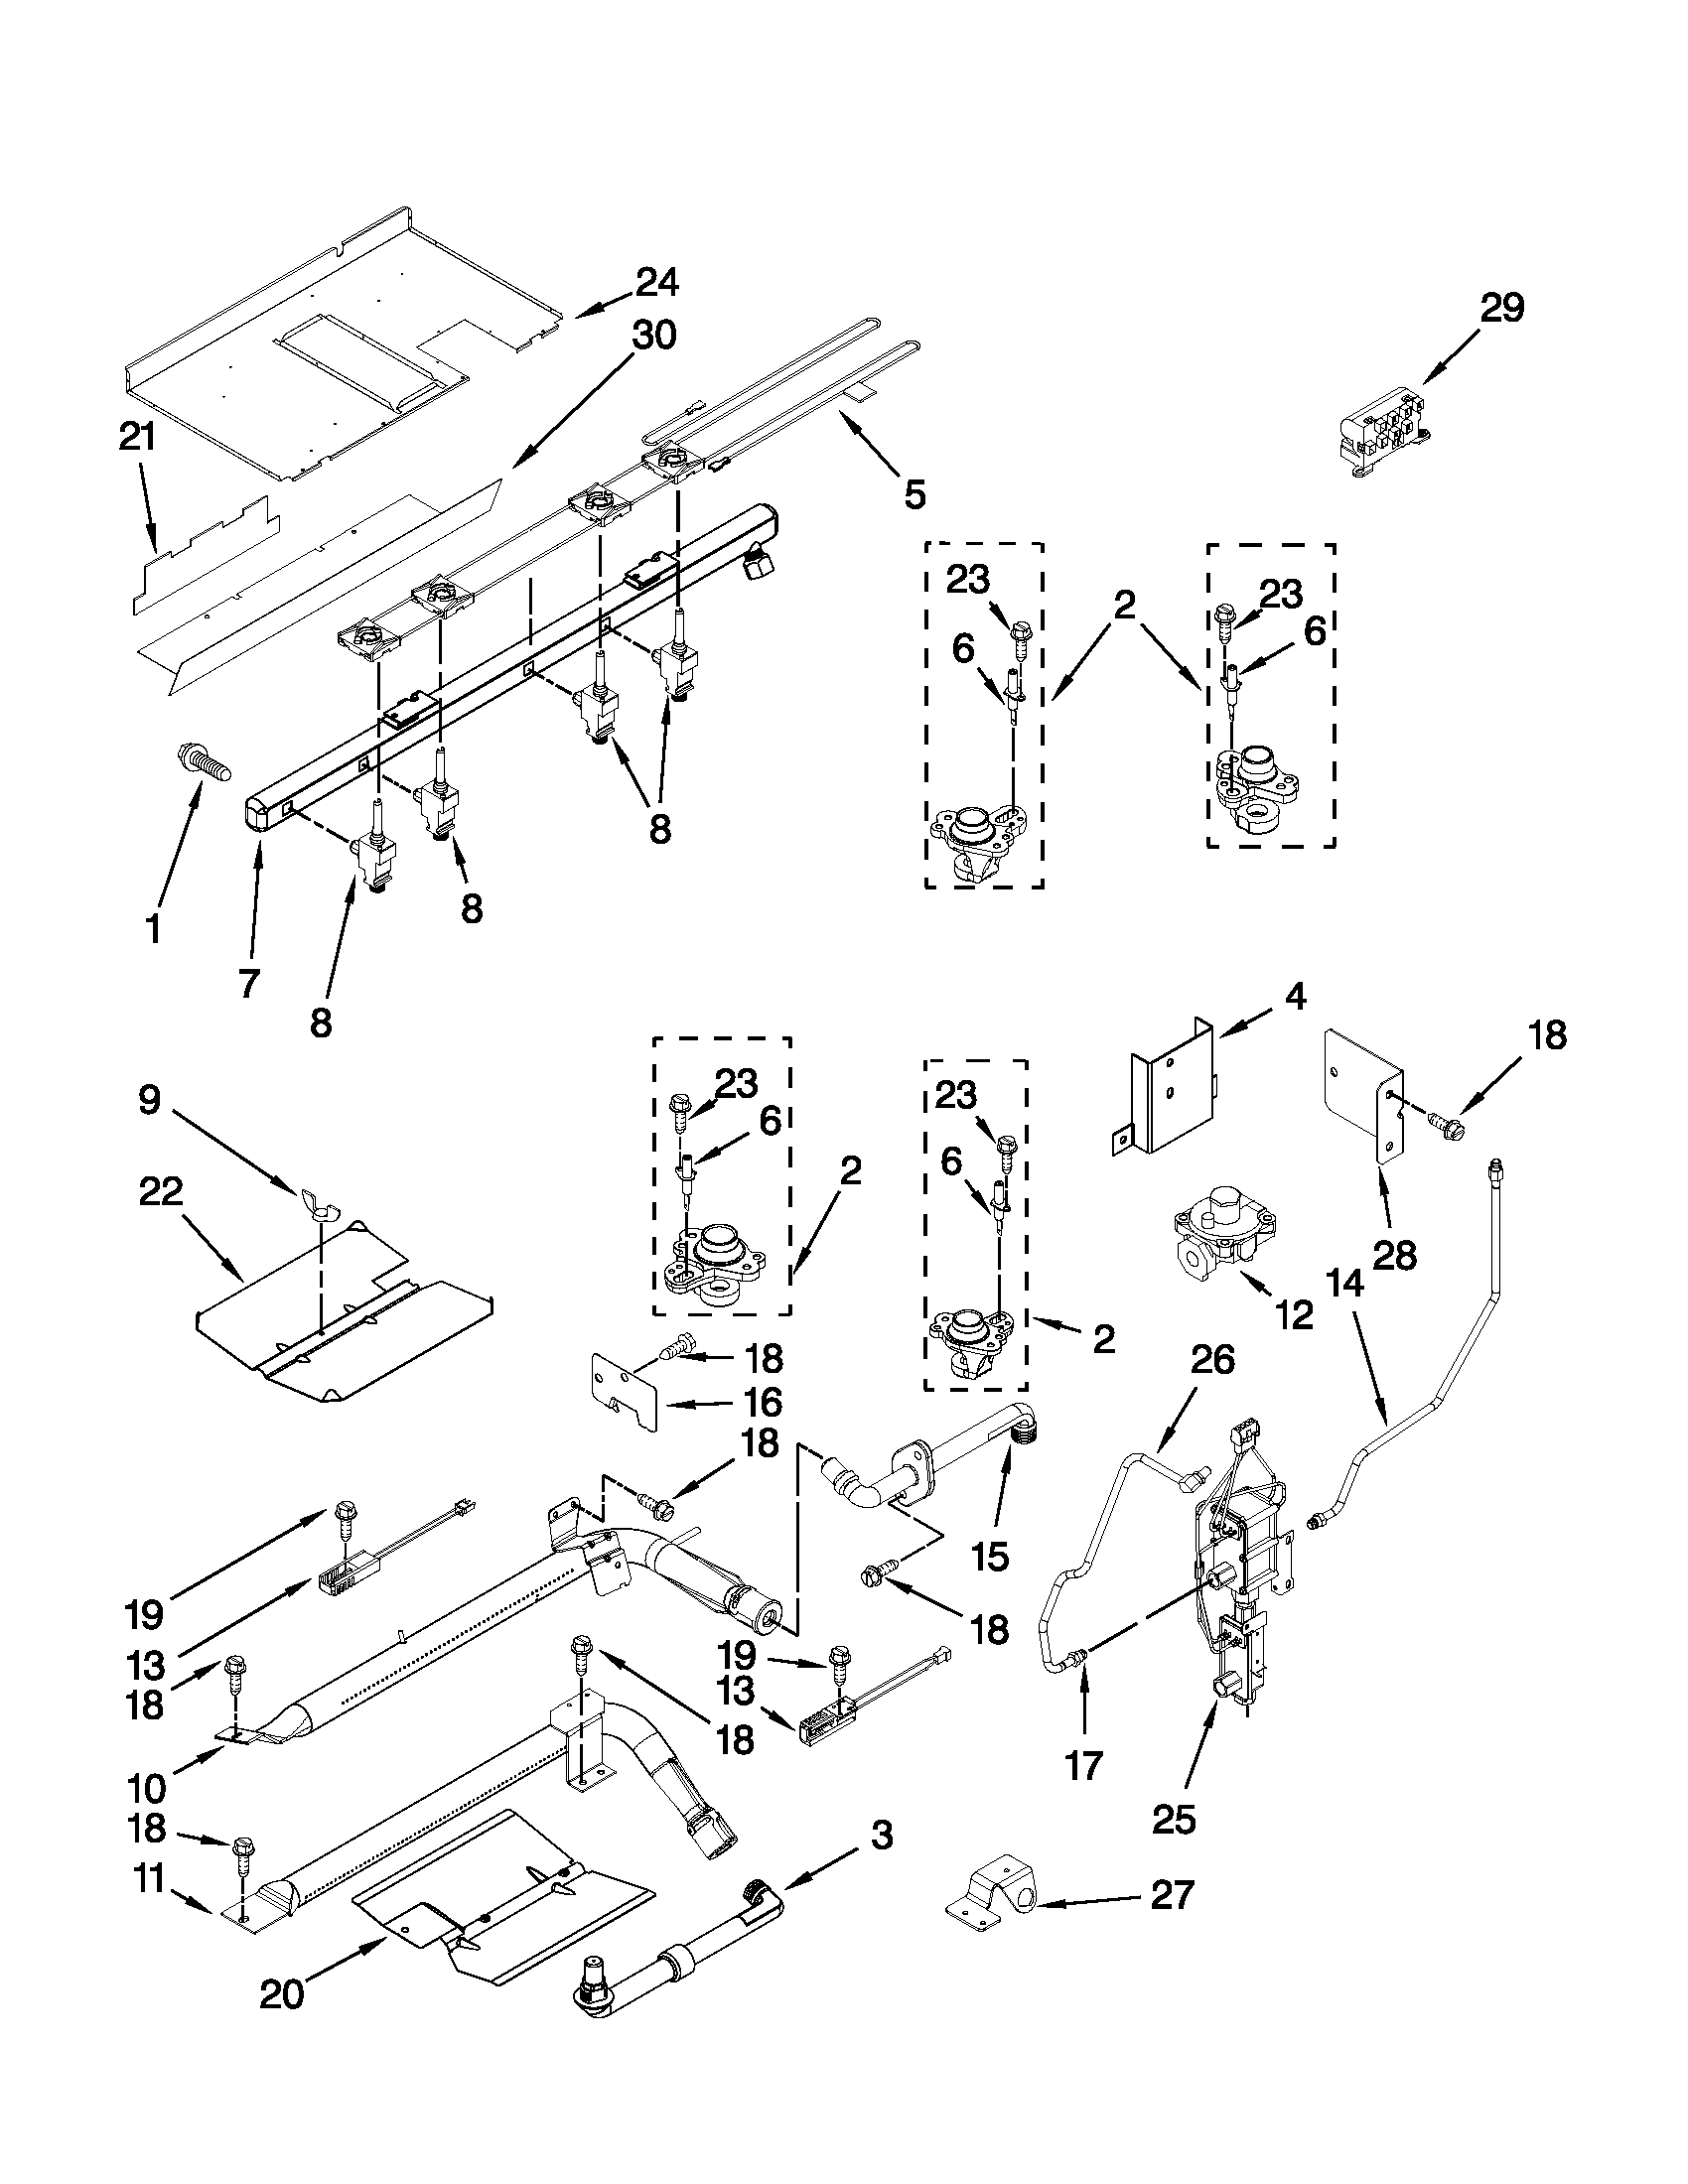 MANIFOLD PARTS Diagram & Parts List for Model jgs9900cdb01